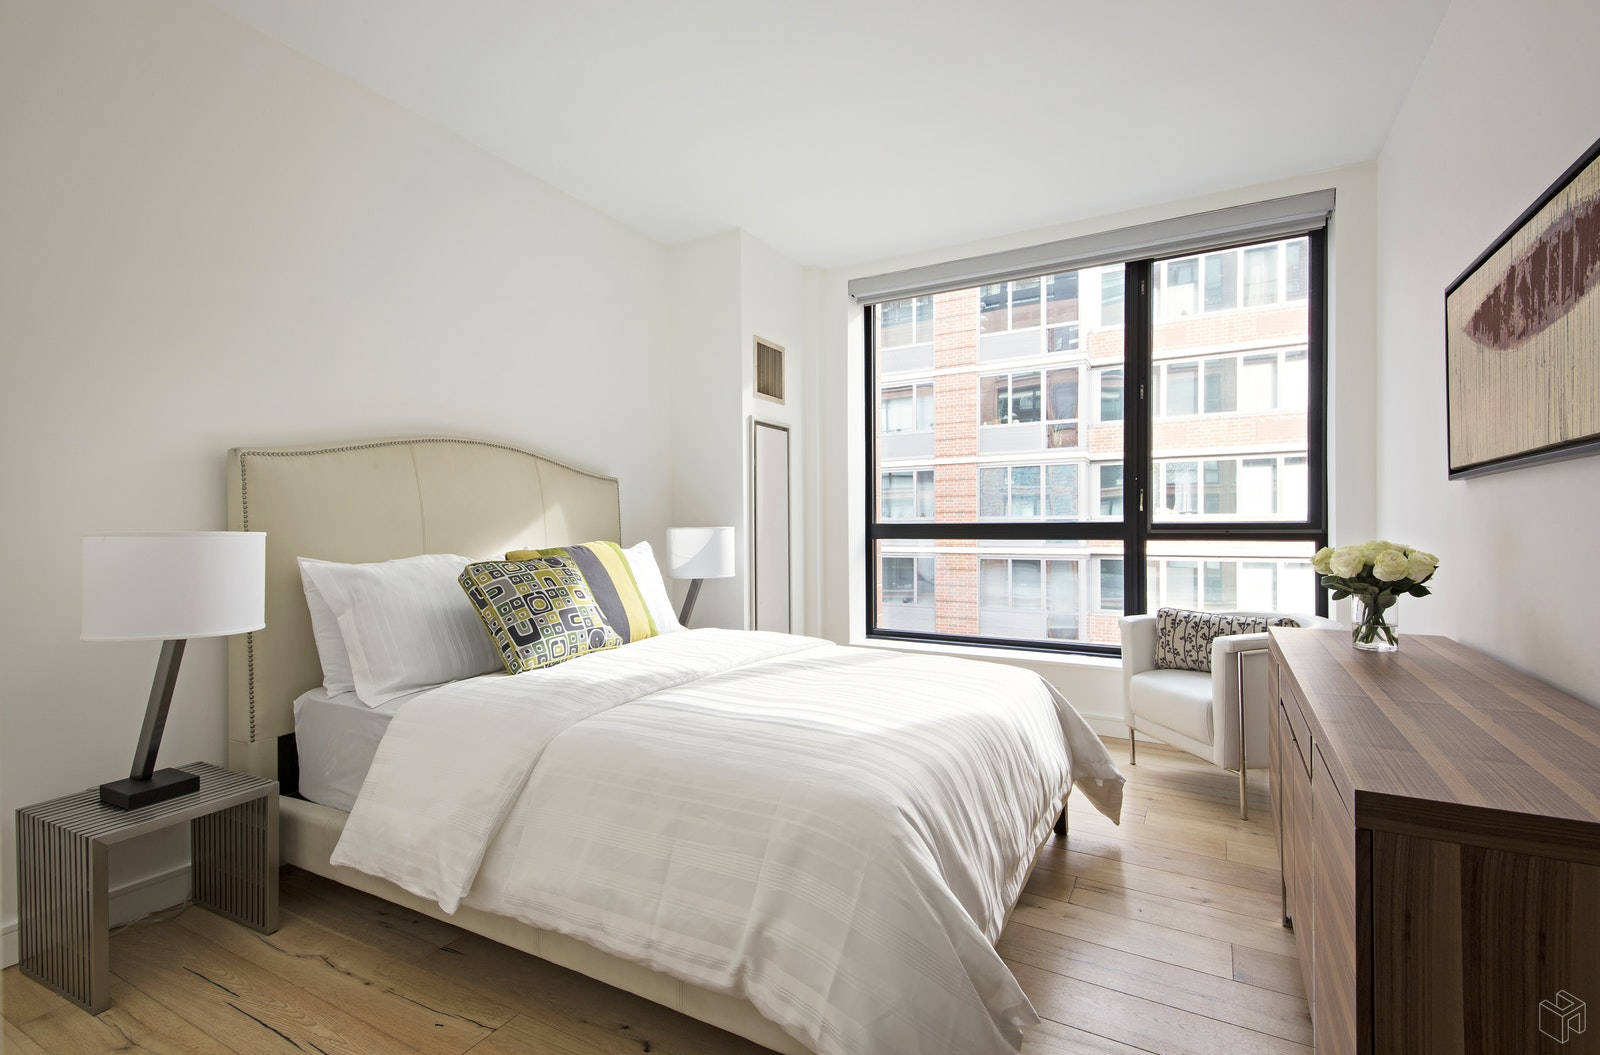 540 WEST 28TH STREET 6E, Chelsea, $1,099,000, Web #: 19164487